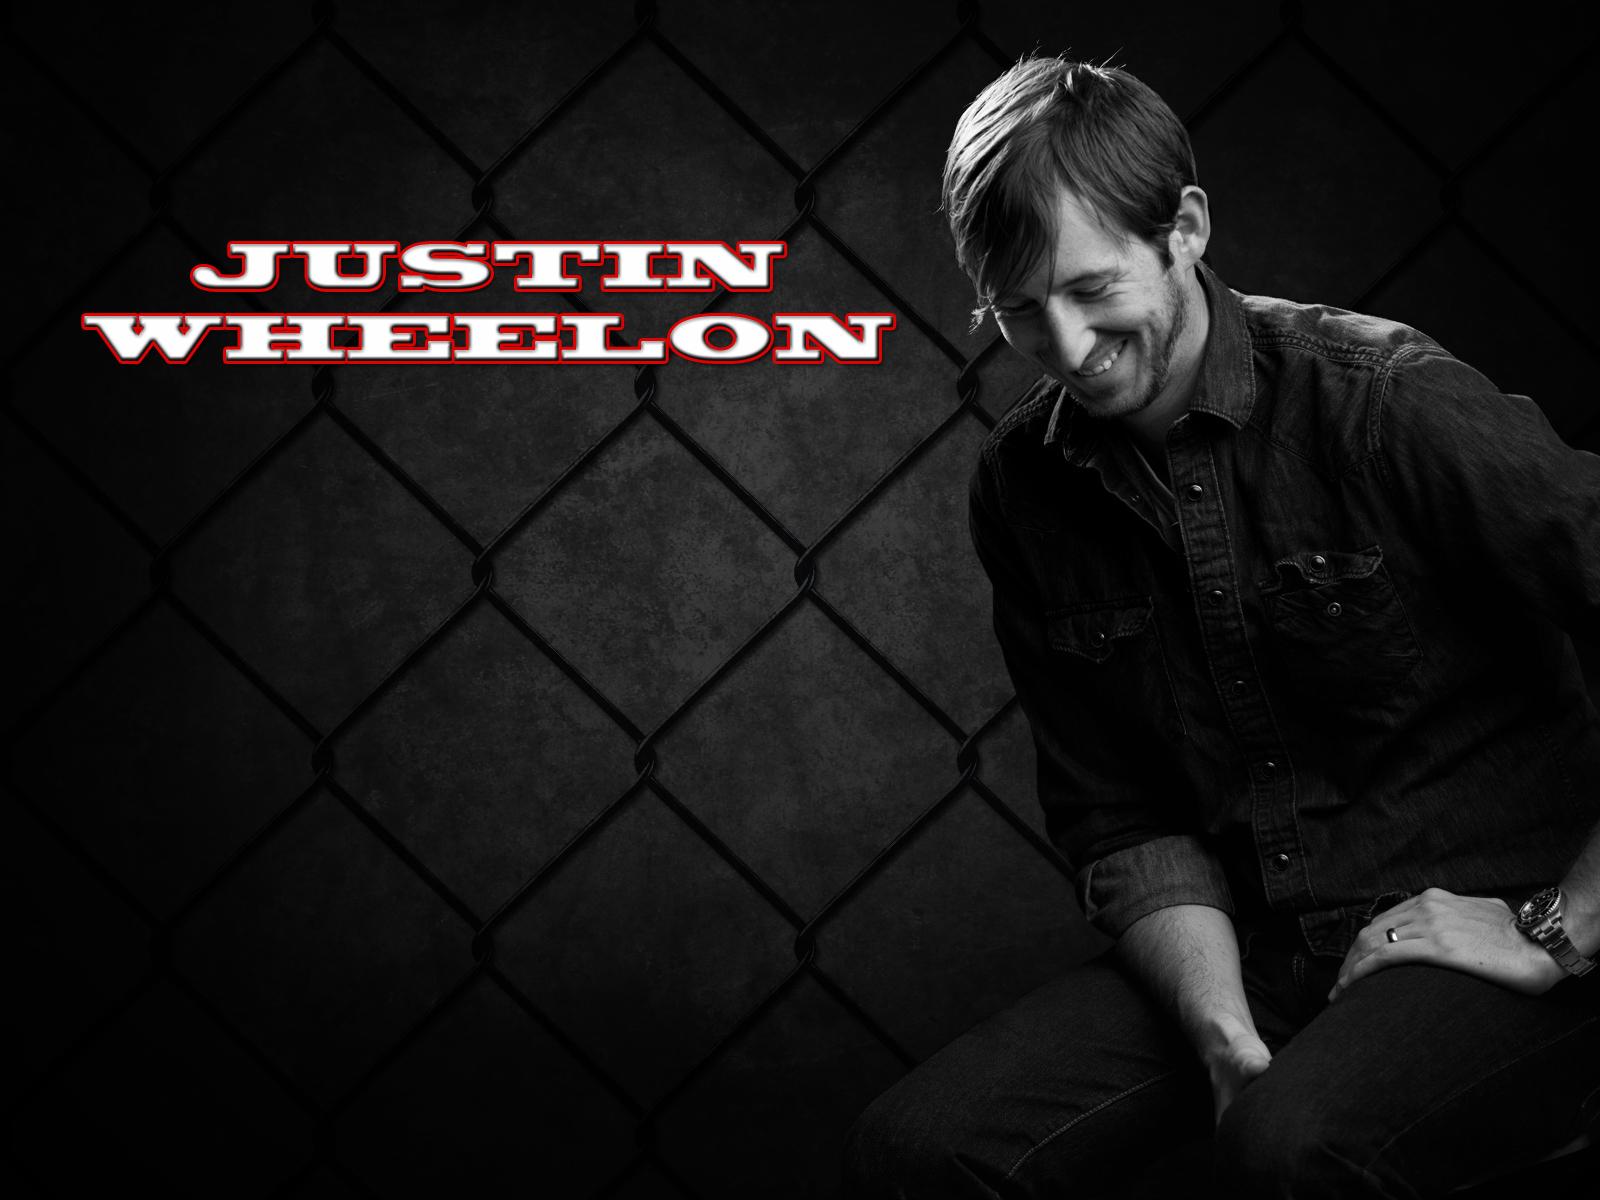 Justin Wheelon : The Ultimate Hero: Justin Wheelon Award list